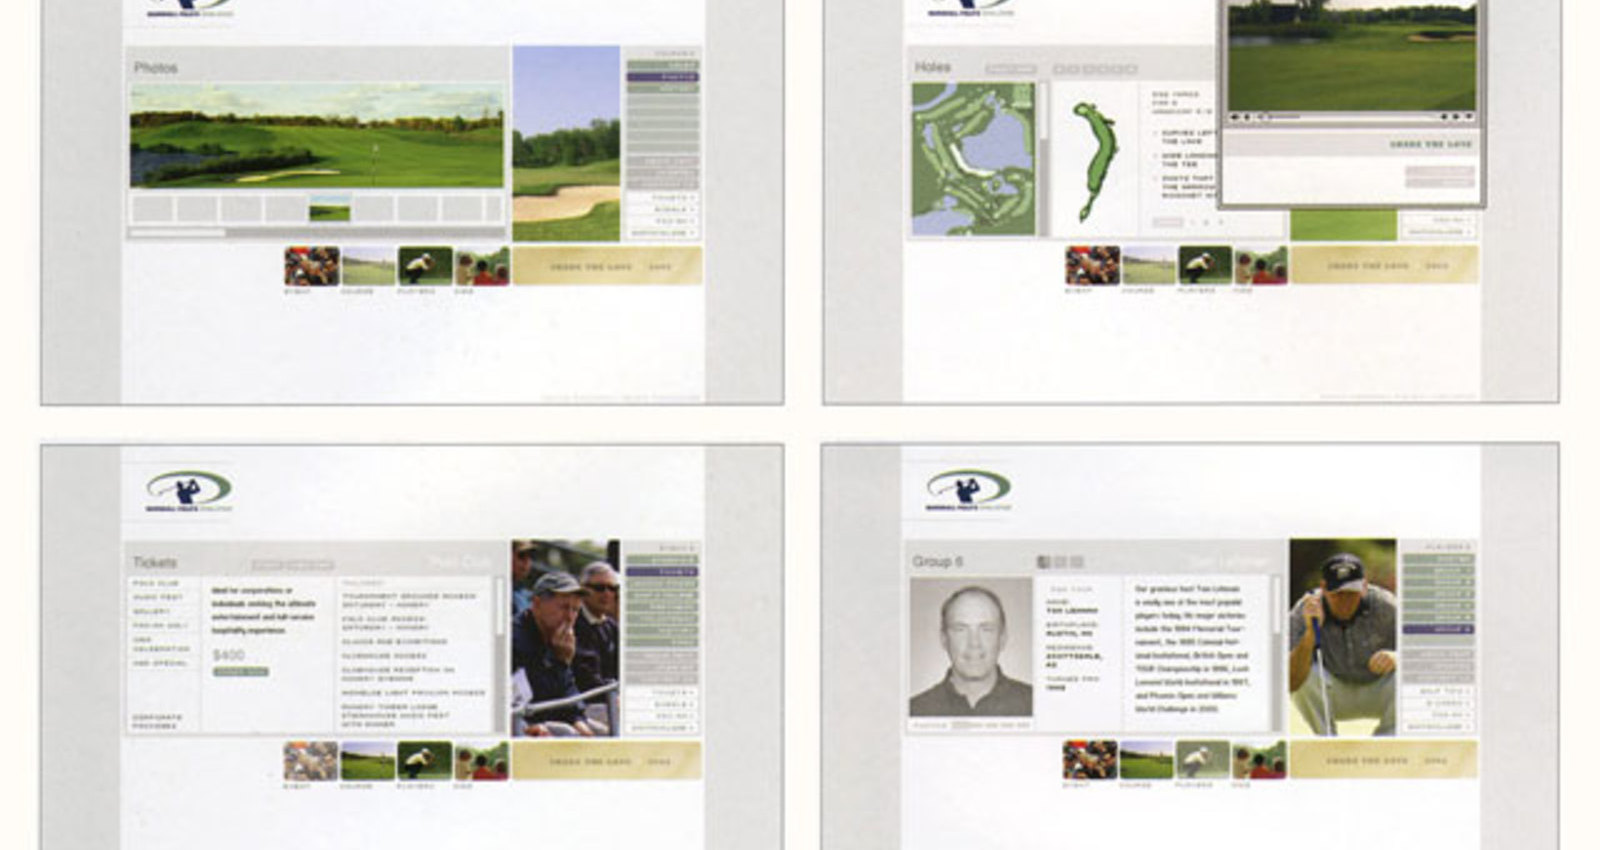 Marshall Fields Challenge, Tom Lehman Golf Charities